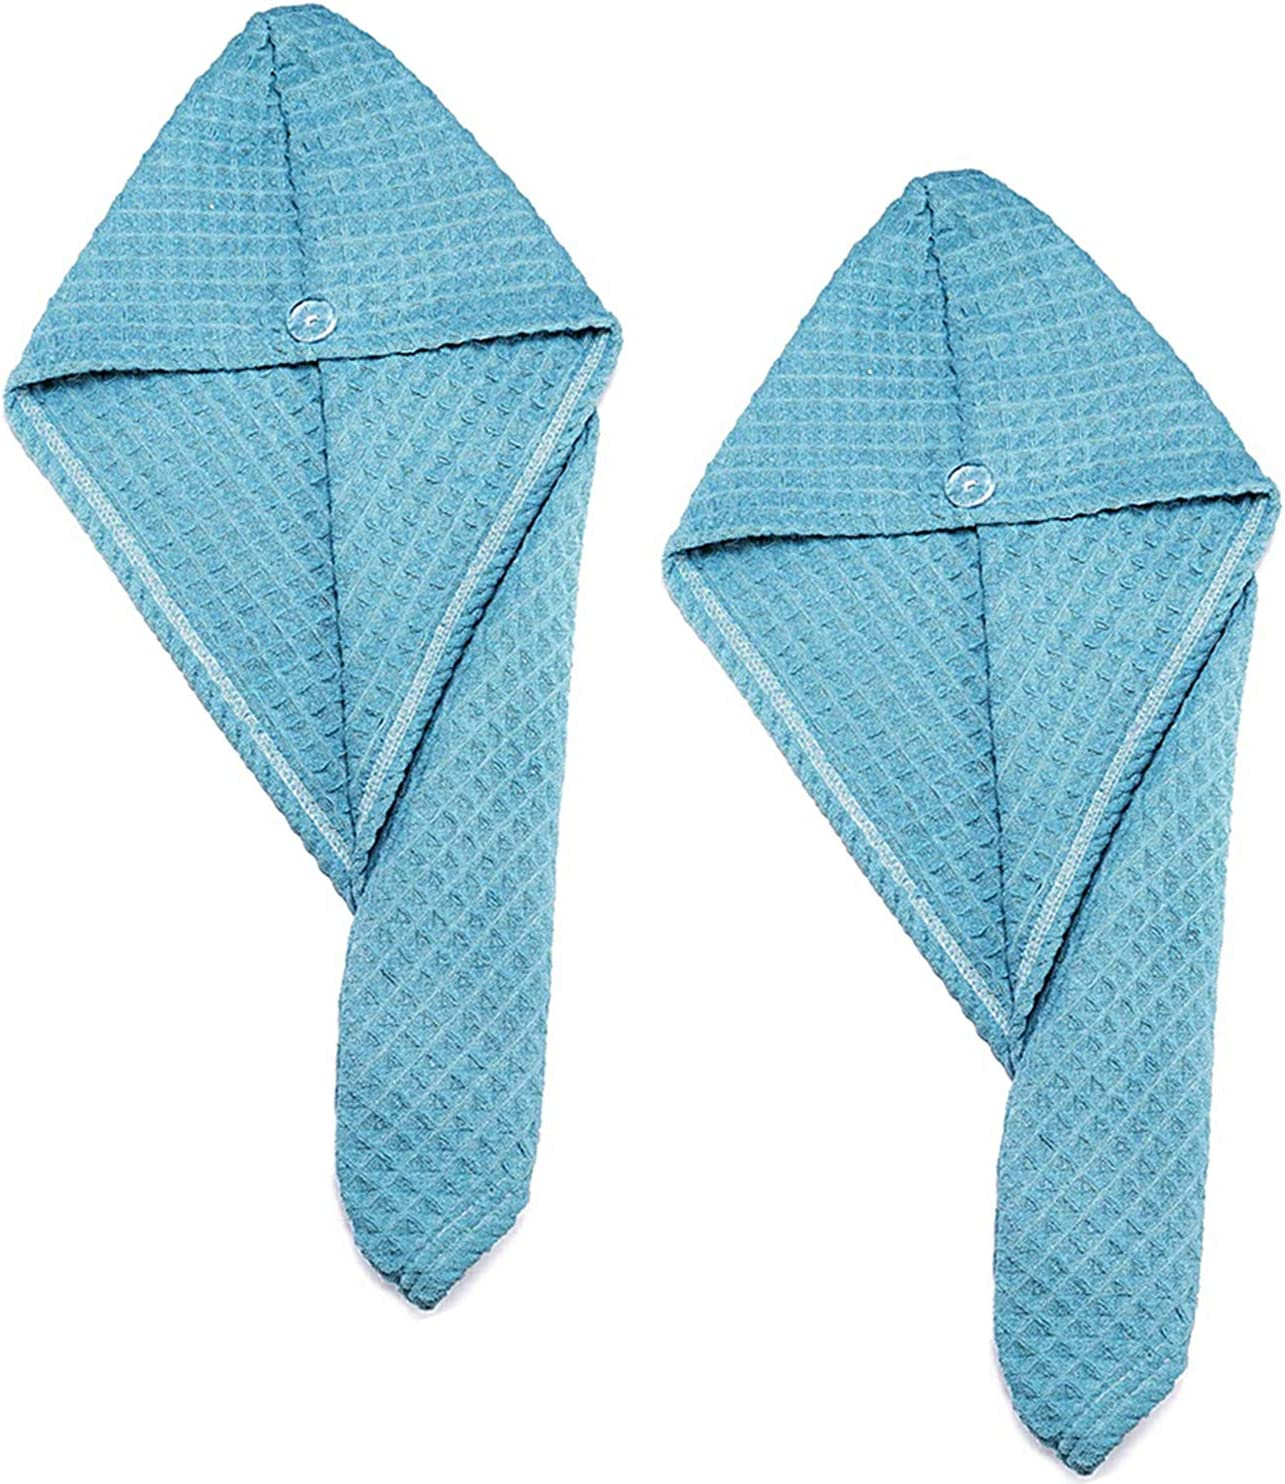 Toallas de Ba/ño Turbante del Abrigo de Pelo Secado R/ápido de Microfibra Suave Absorbentes de Agua Pelo Ouinne 2 Piezas Gorro De Ducha